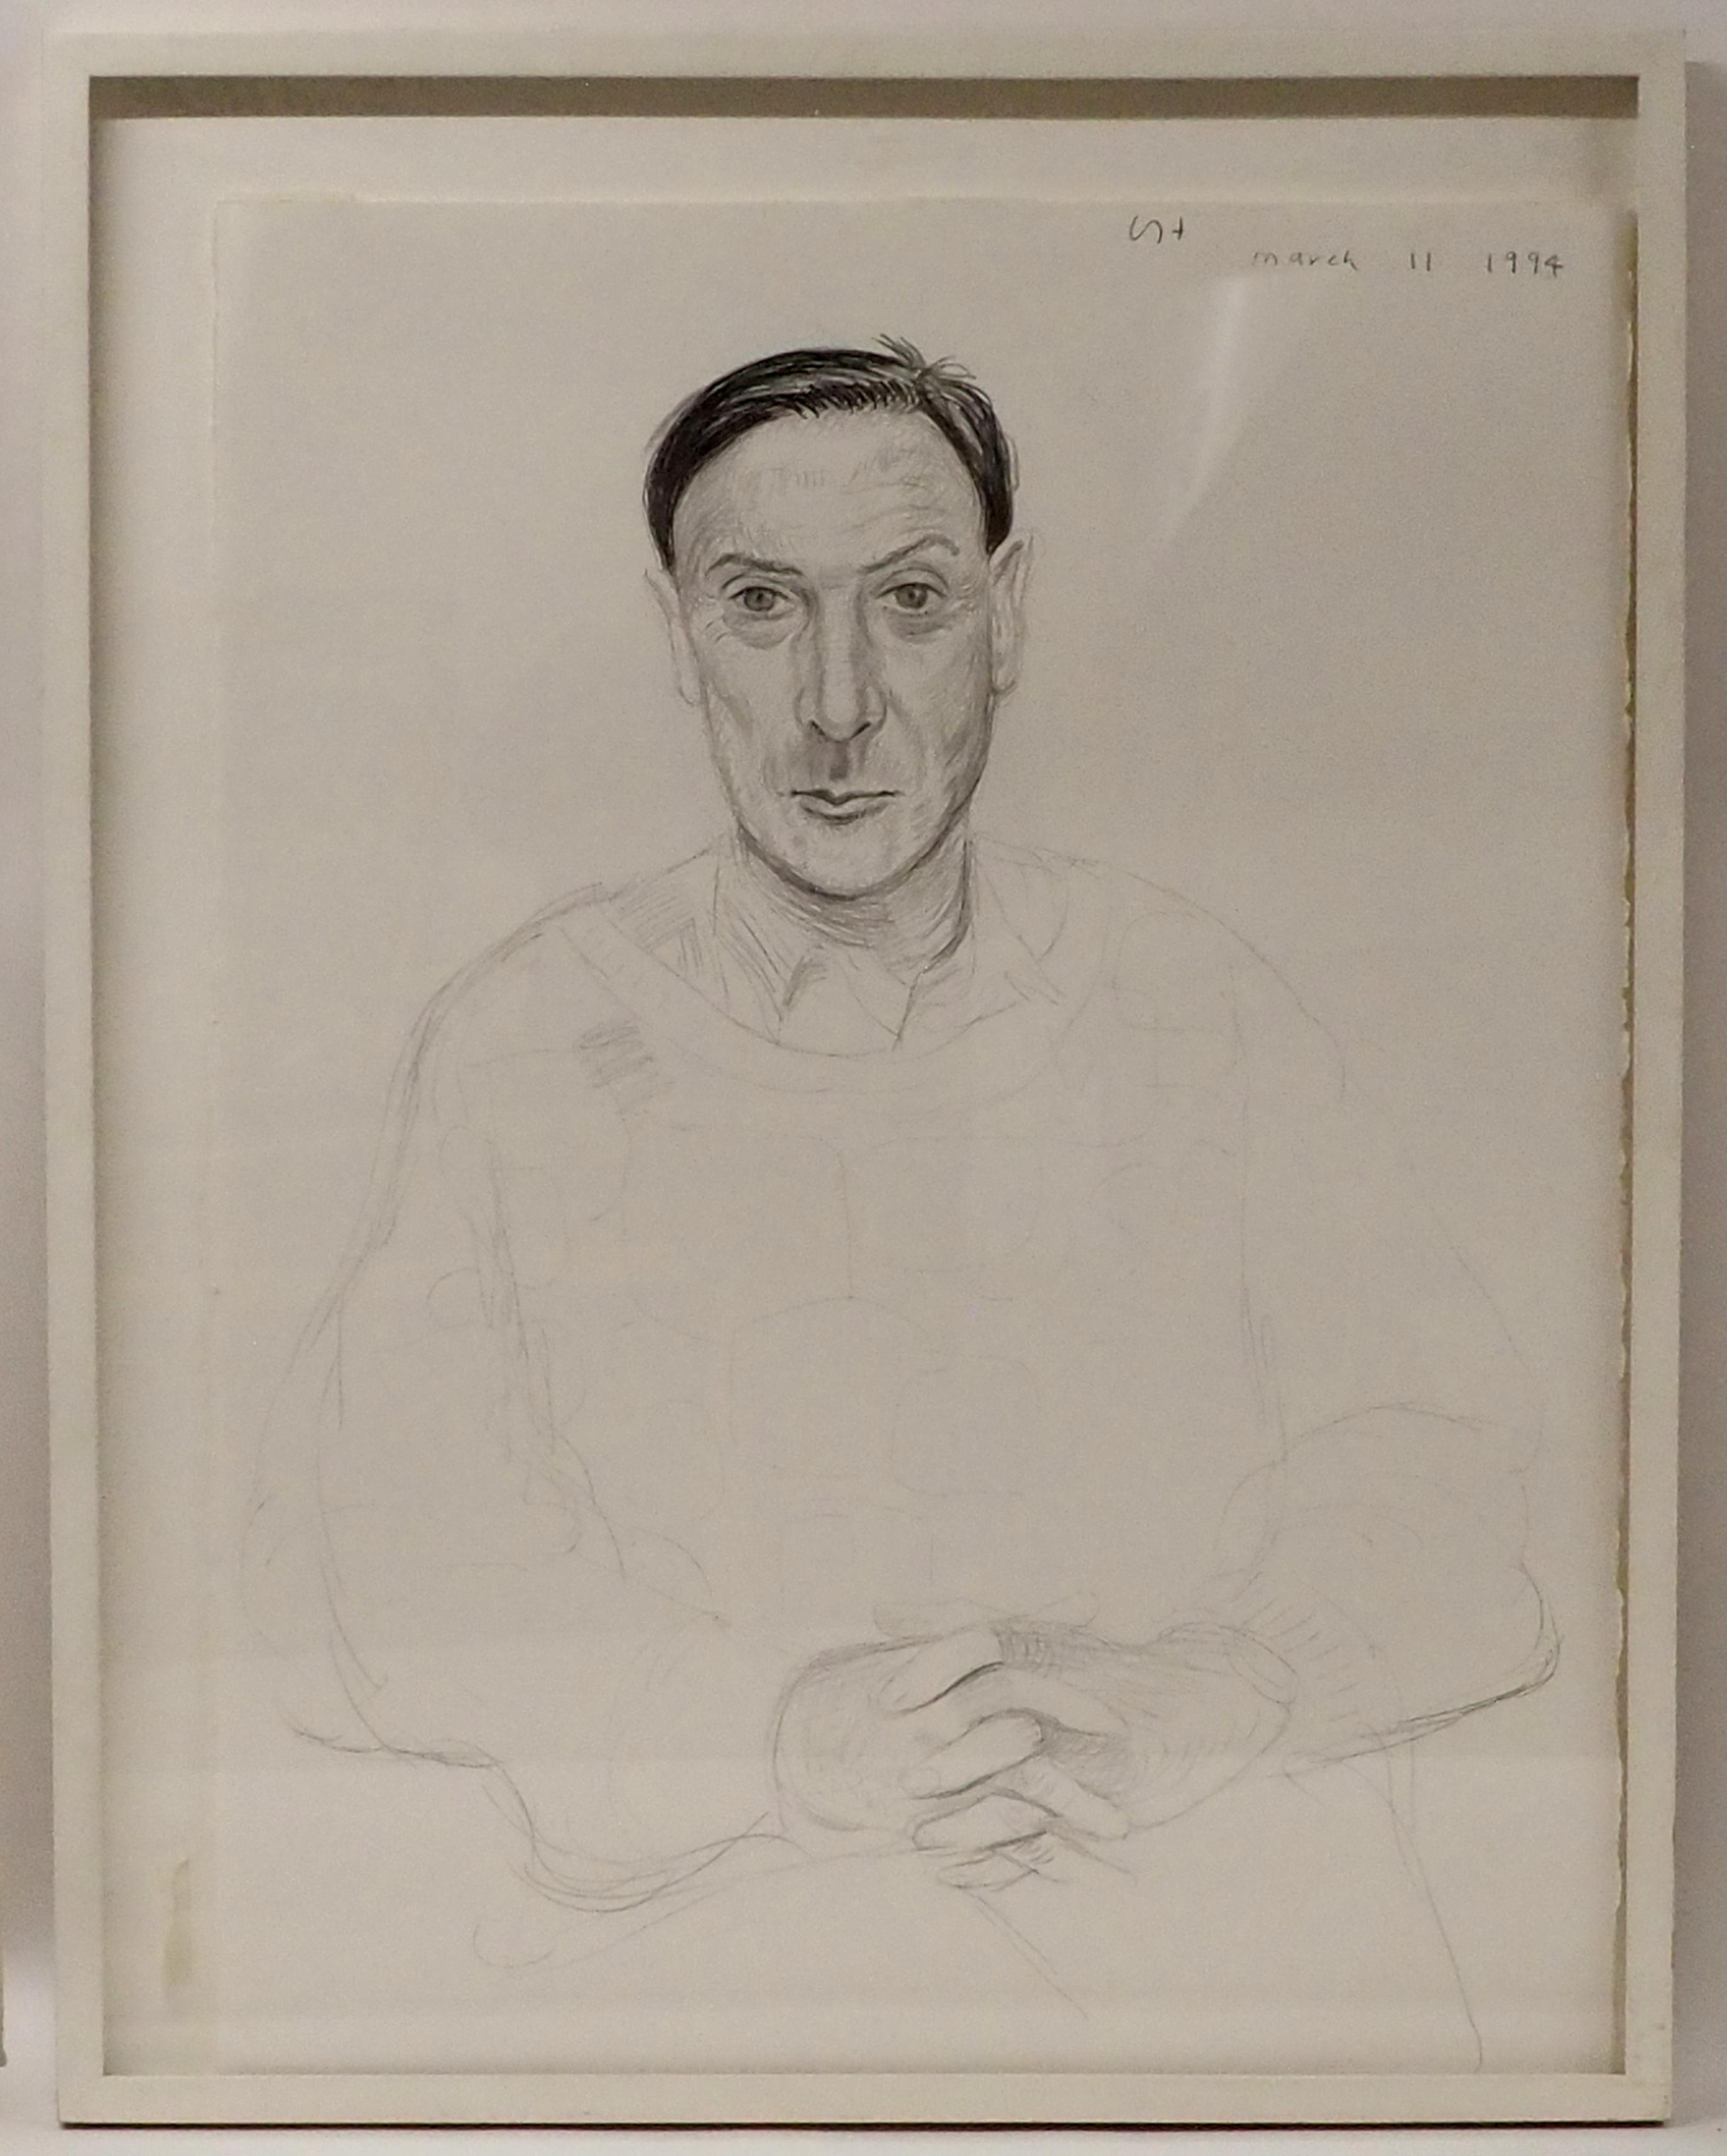 •DAVID HOCKNEY OM, CH, RA (BRITISH b. 1937) WILLIAM HARDIE MARCH 11, 1994 Graphite crayon, signed